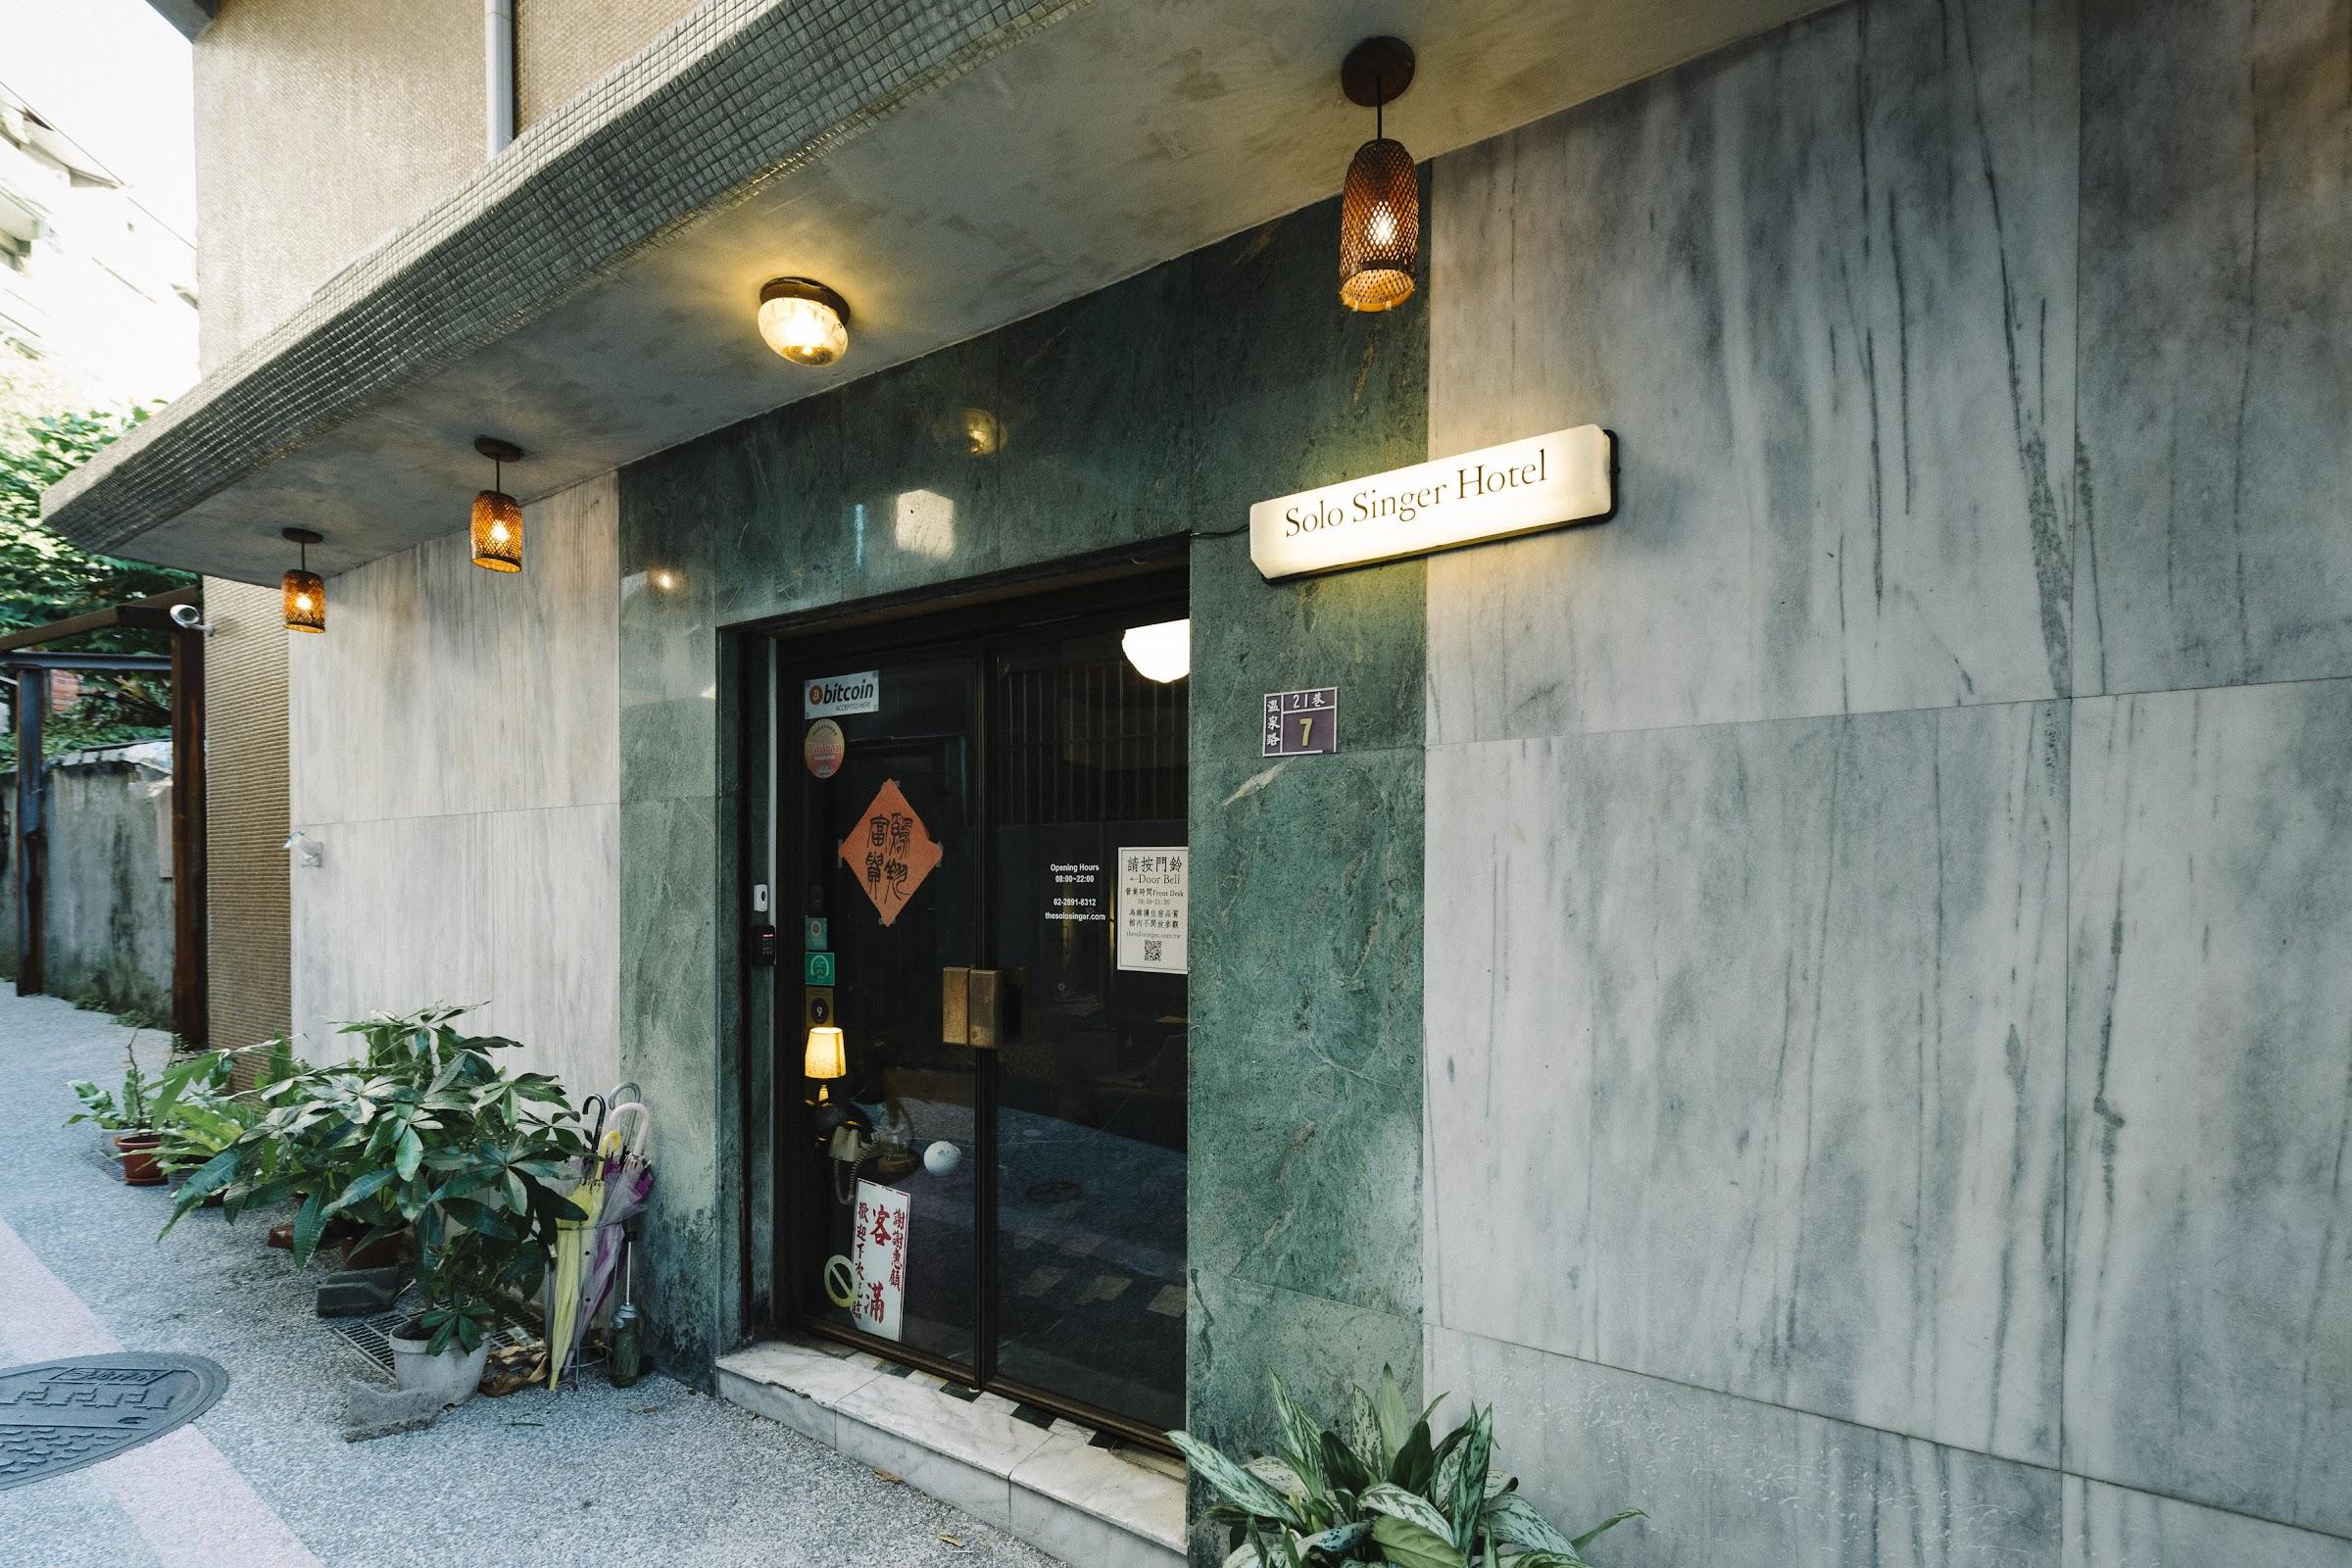 旅館常見問題 FAQ - Solo Singer Hotel Taipei Cultural Hotel 臺北民宿文化旅館